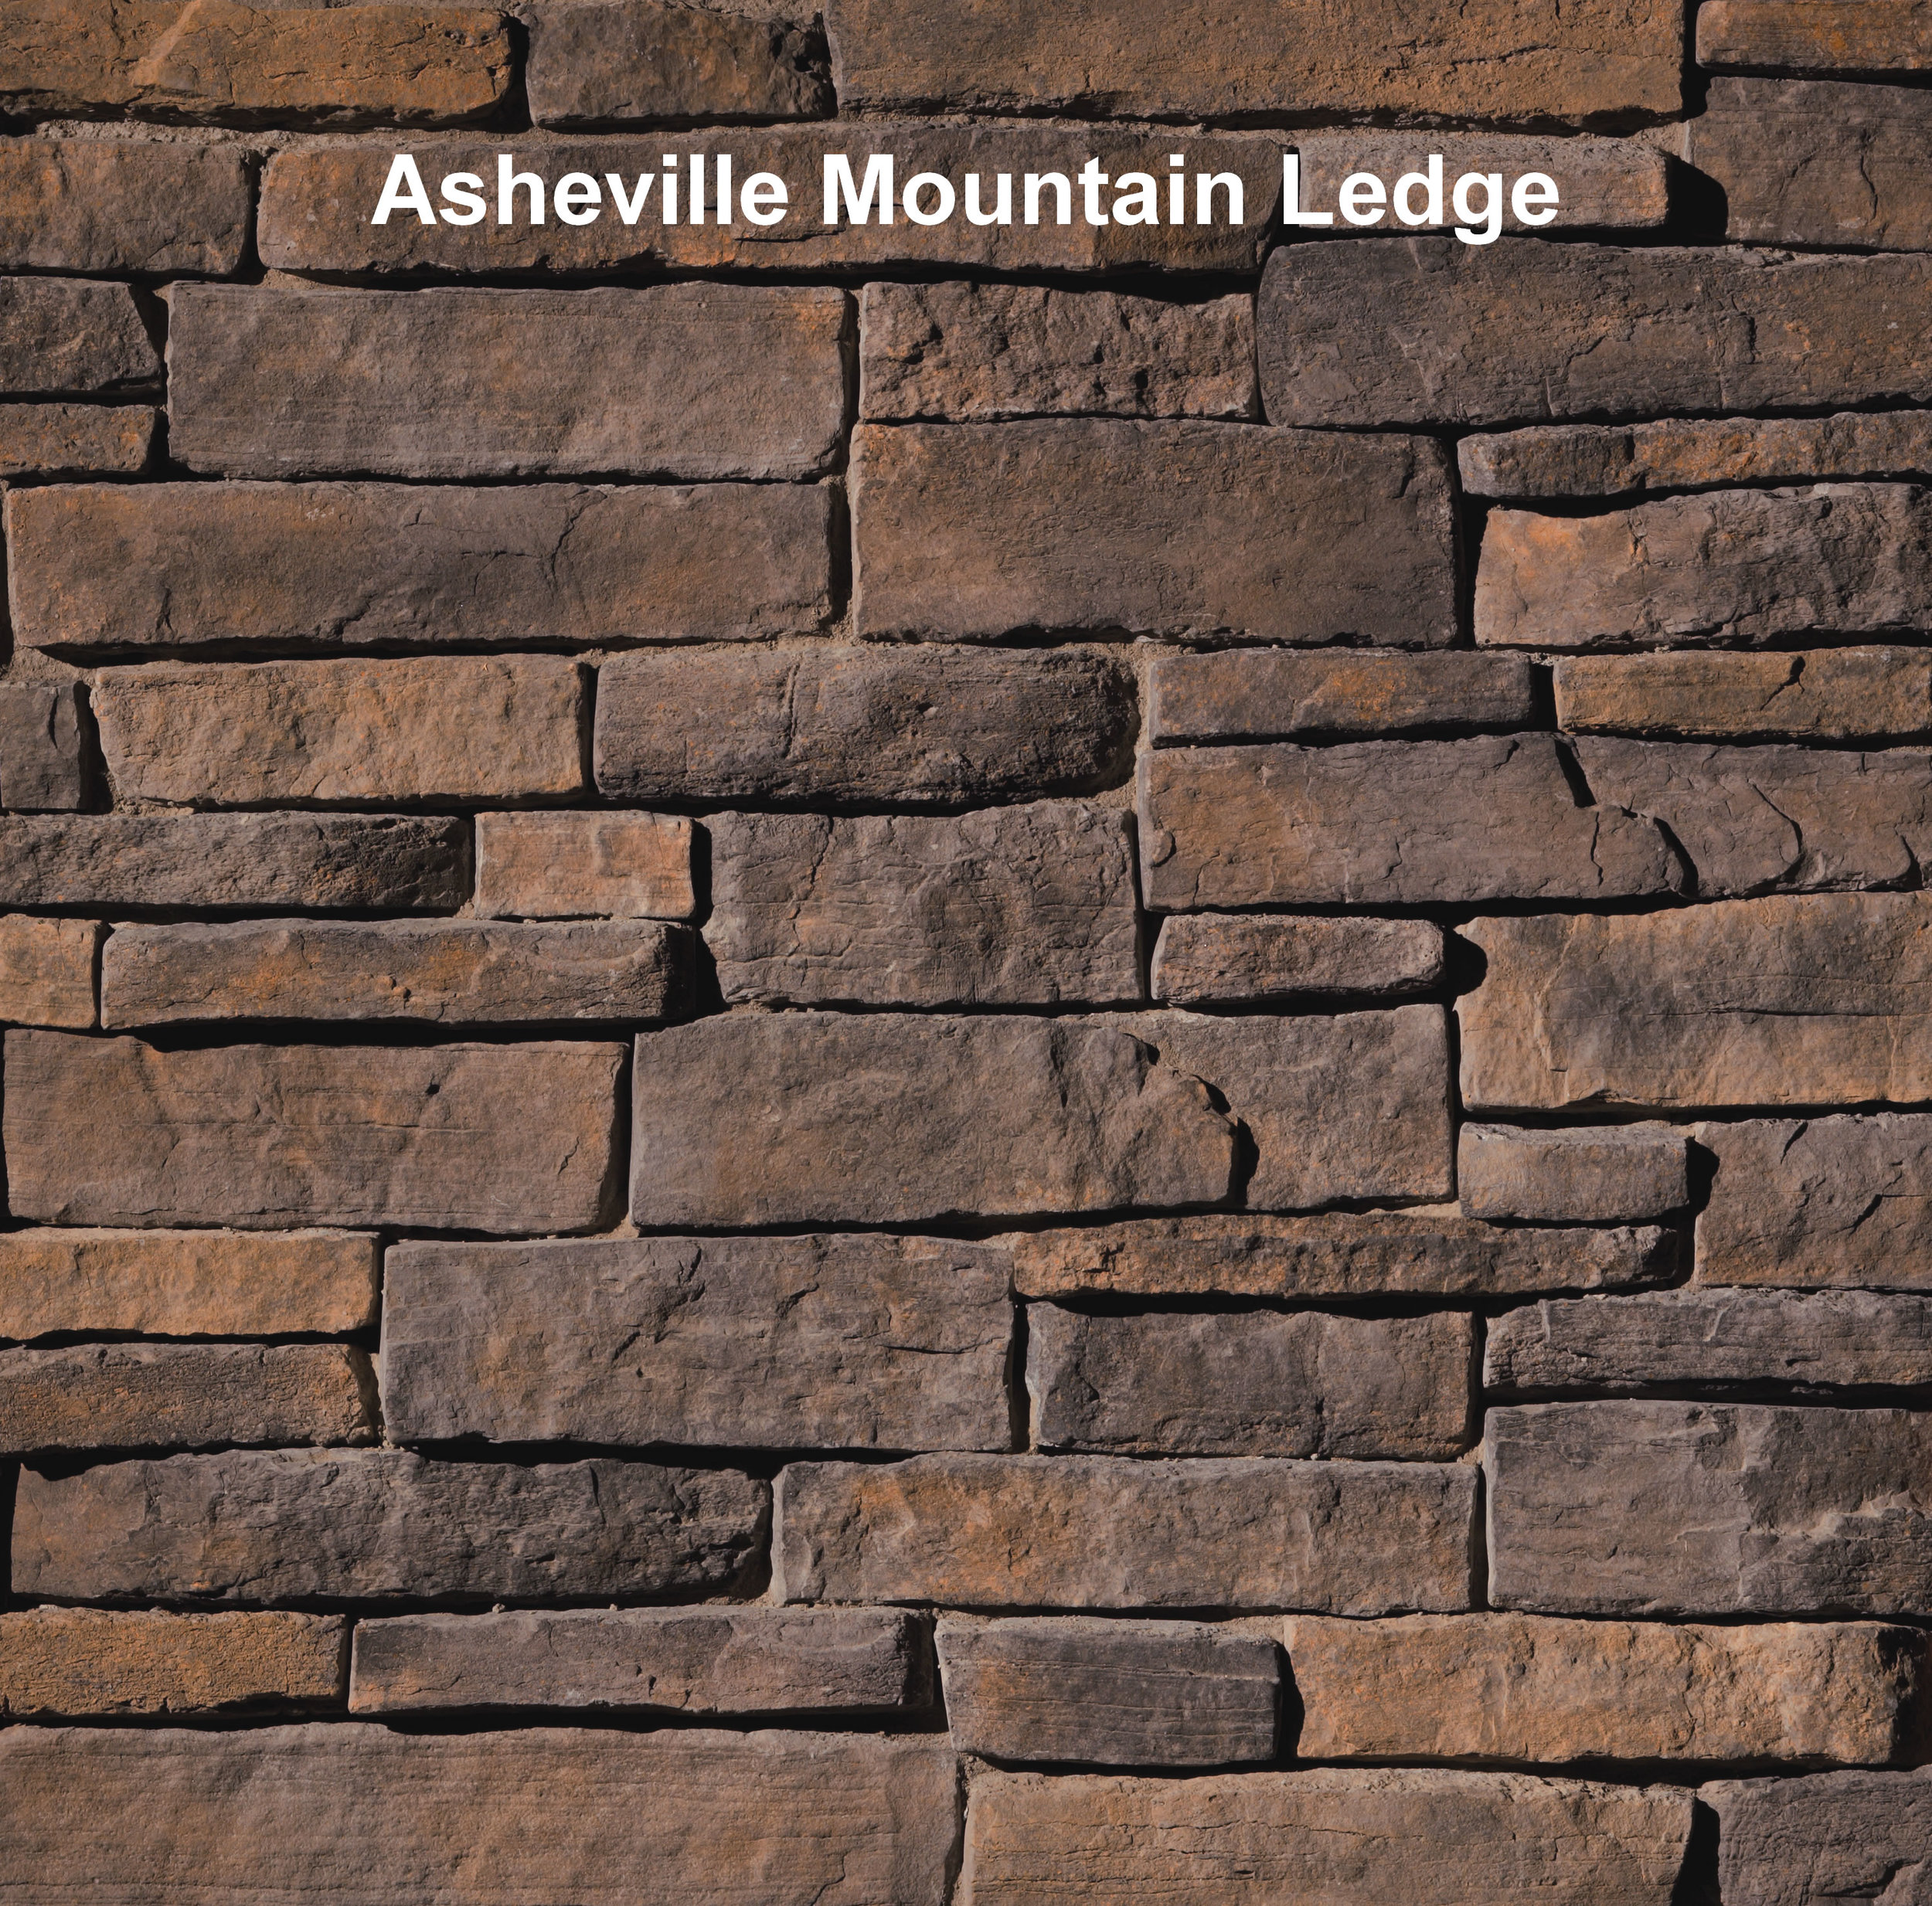 ES_Mountain Ledge_Asheville_profile_east.jpg